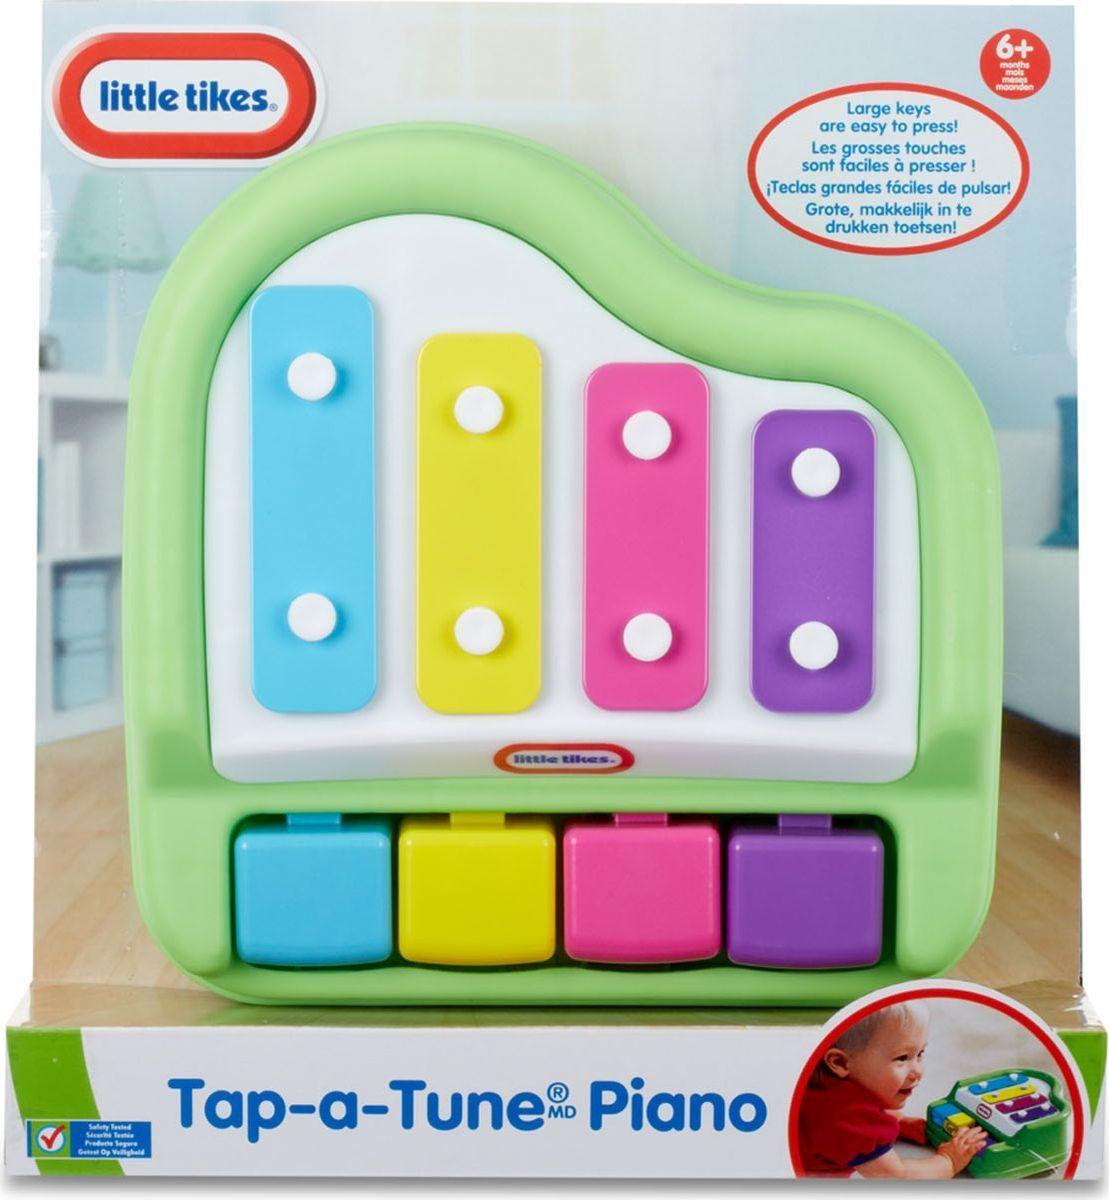 Музыкальная игрушка Little Tikes Пианино, 642999E4C игрушка фонарик little tikes панда цвет черный белый